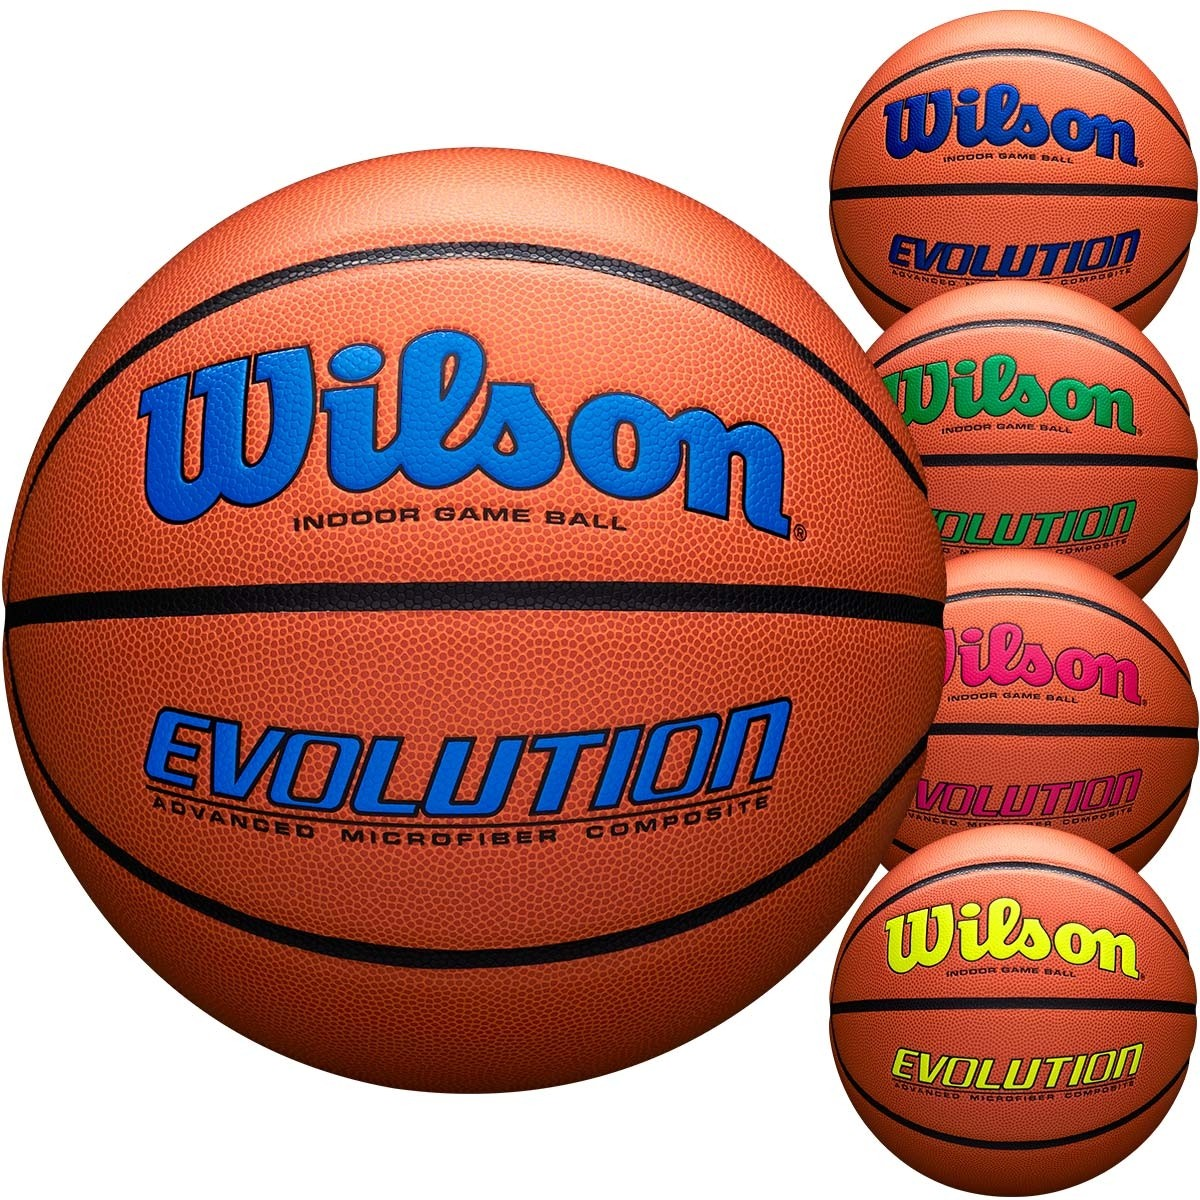 Wilson Official 29.5 Evolution Basketball,